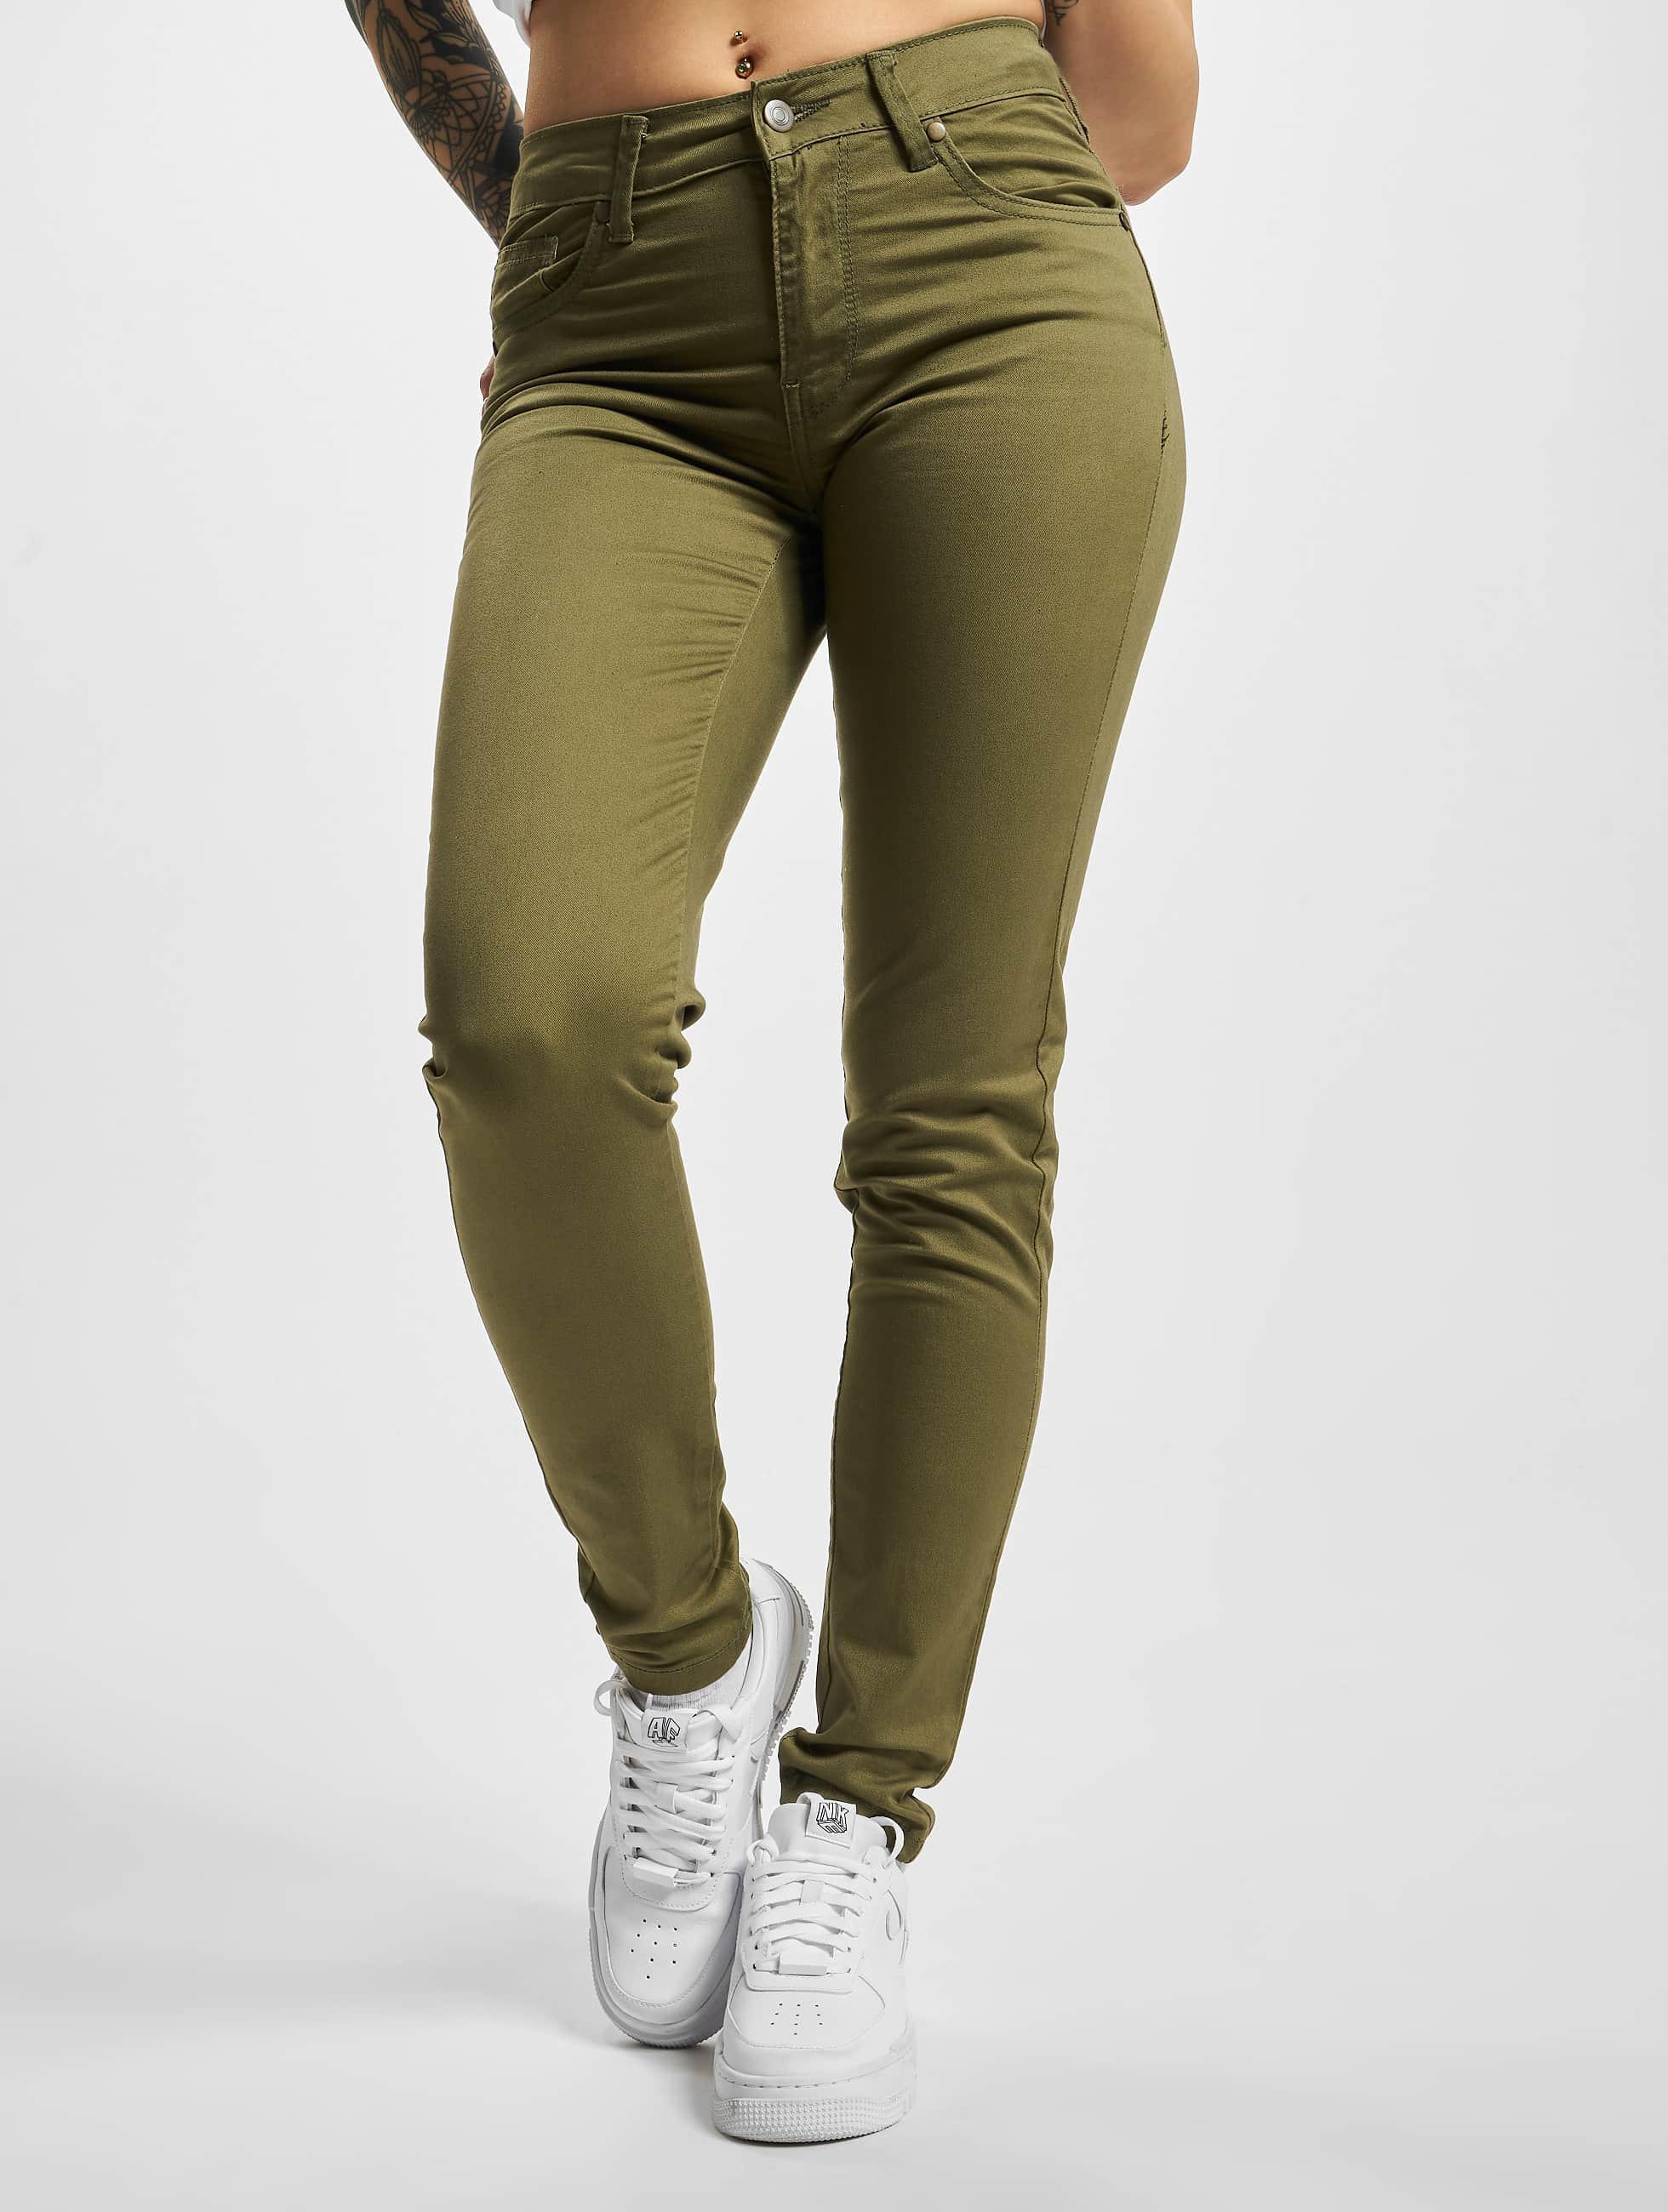 Urban Classics Frauen Skinny Jeans Ladies in olive